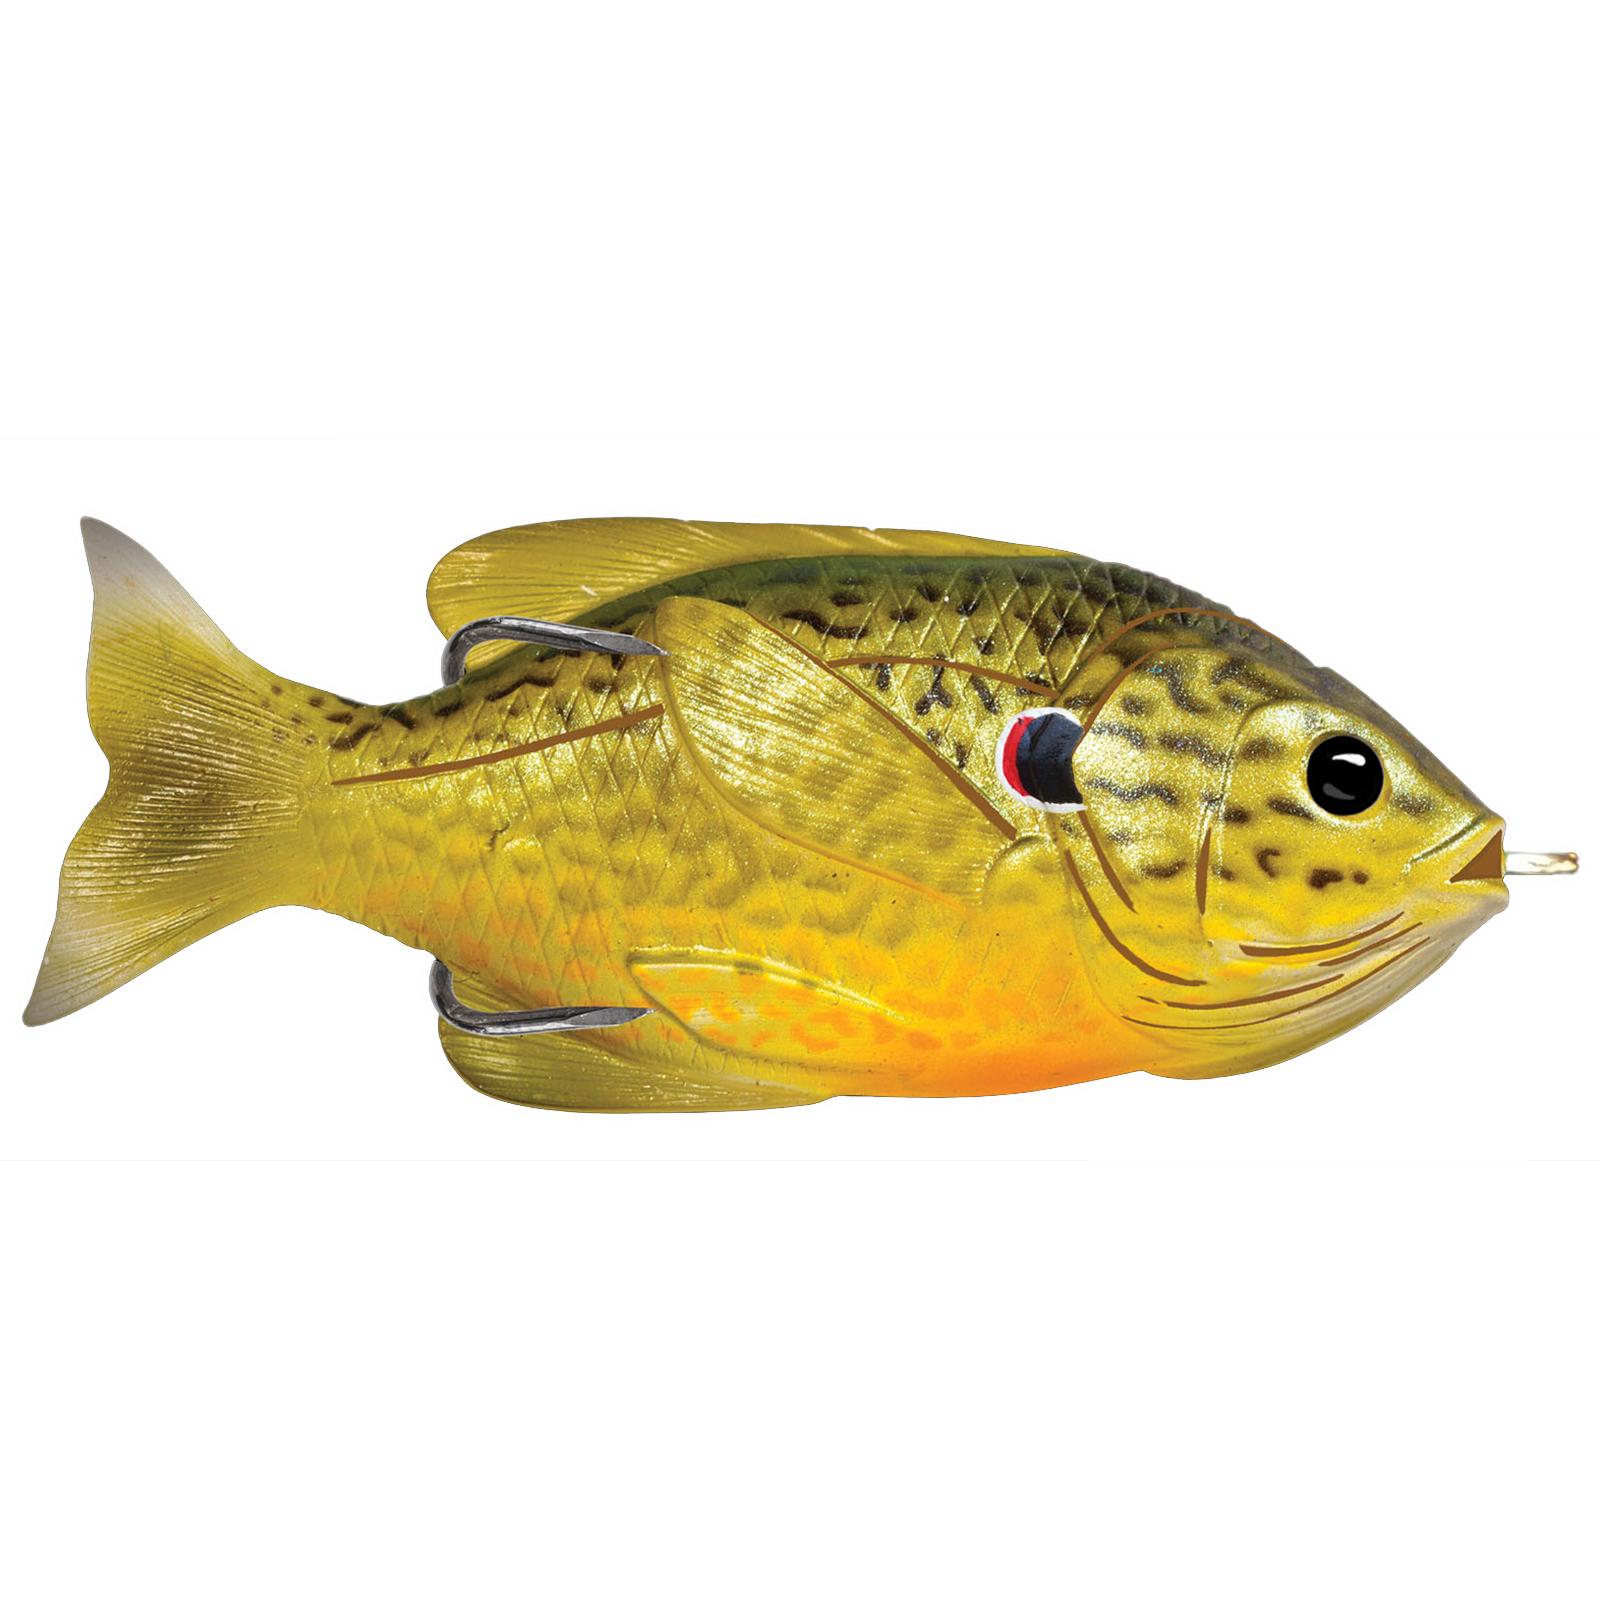 LIVETARGET Sunfish Hollow Body Lure